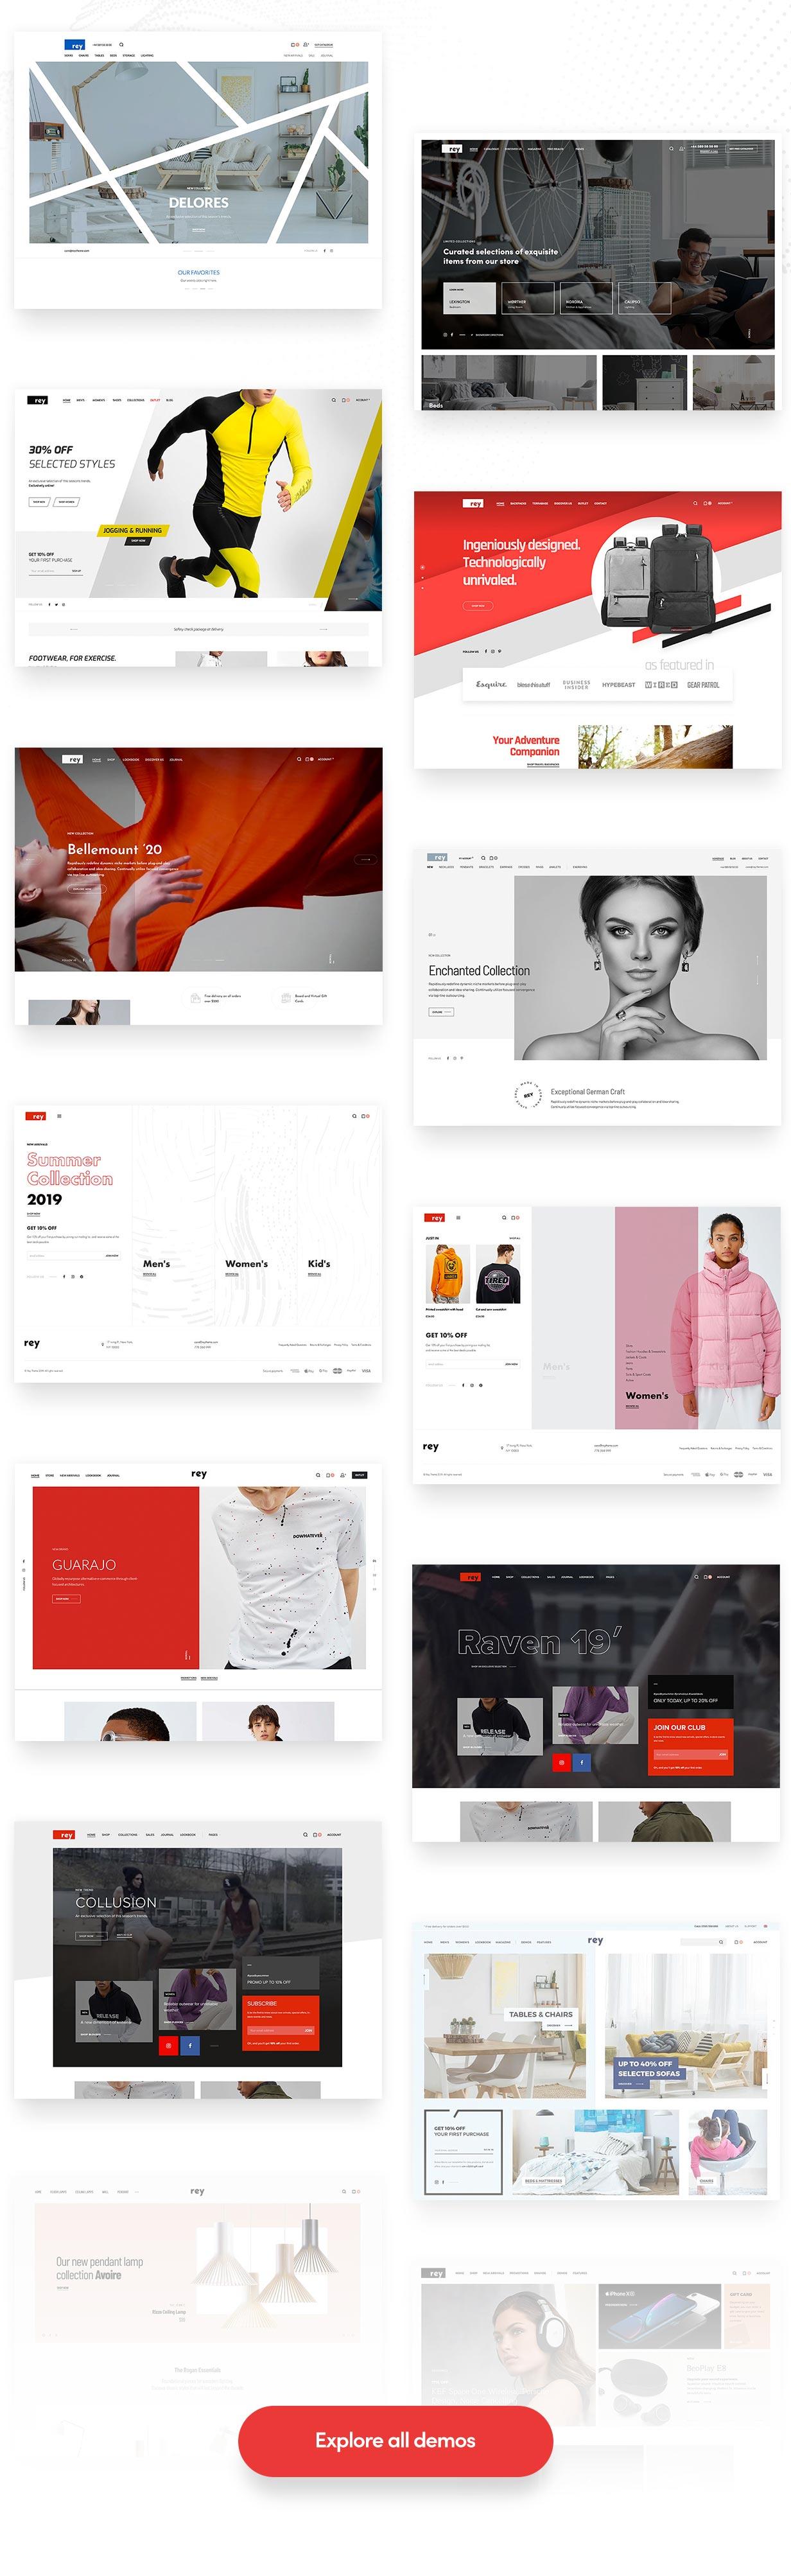 Rey - Multi-purpose & WooCommerce Theme - 4